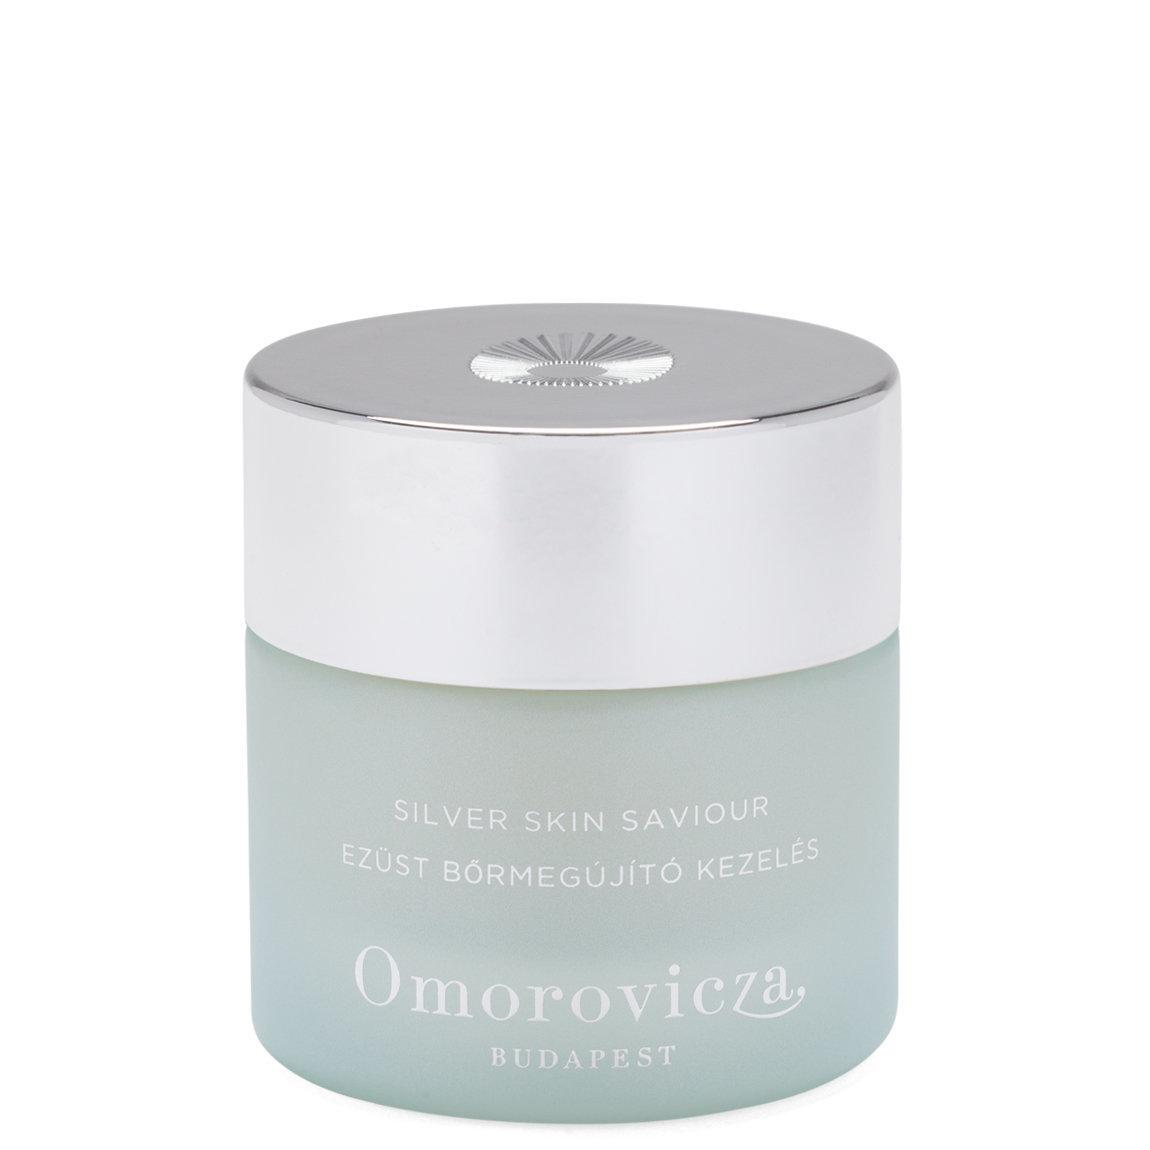 Omorovicza Silver Skin Savior alternative view 1 - product swatch.